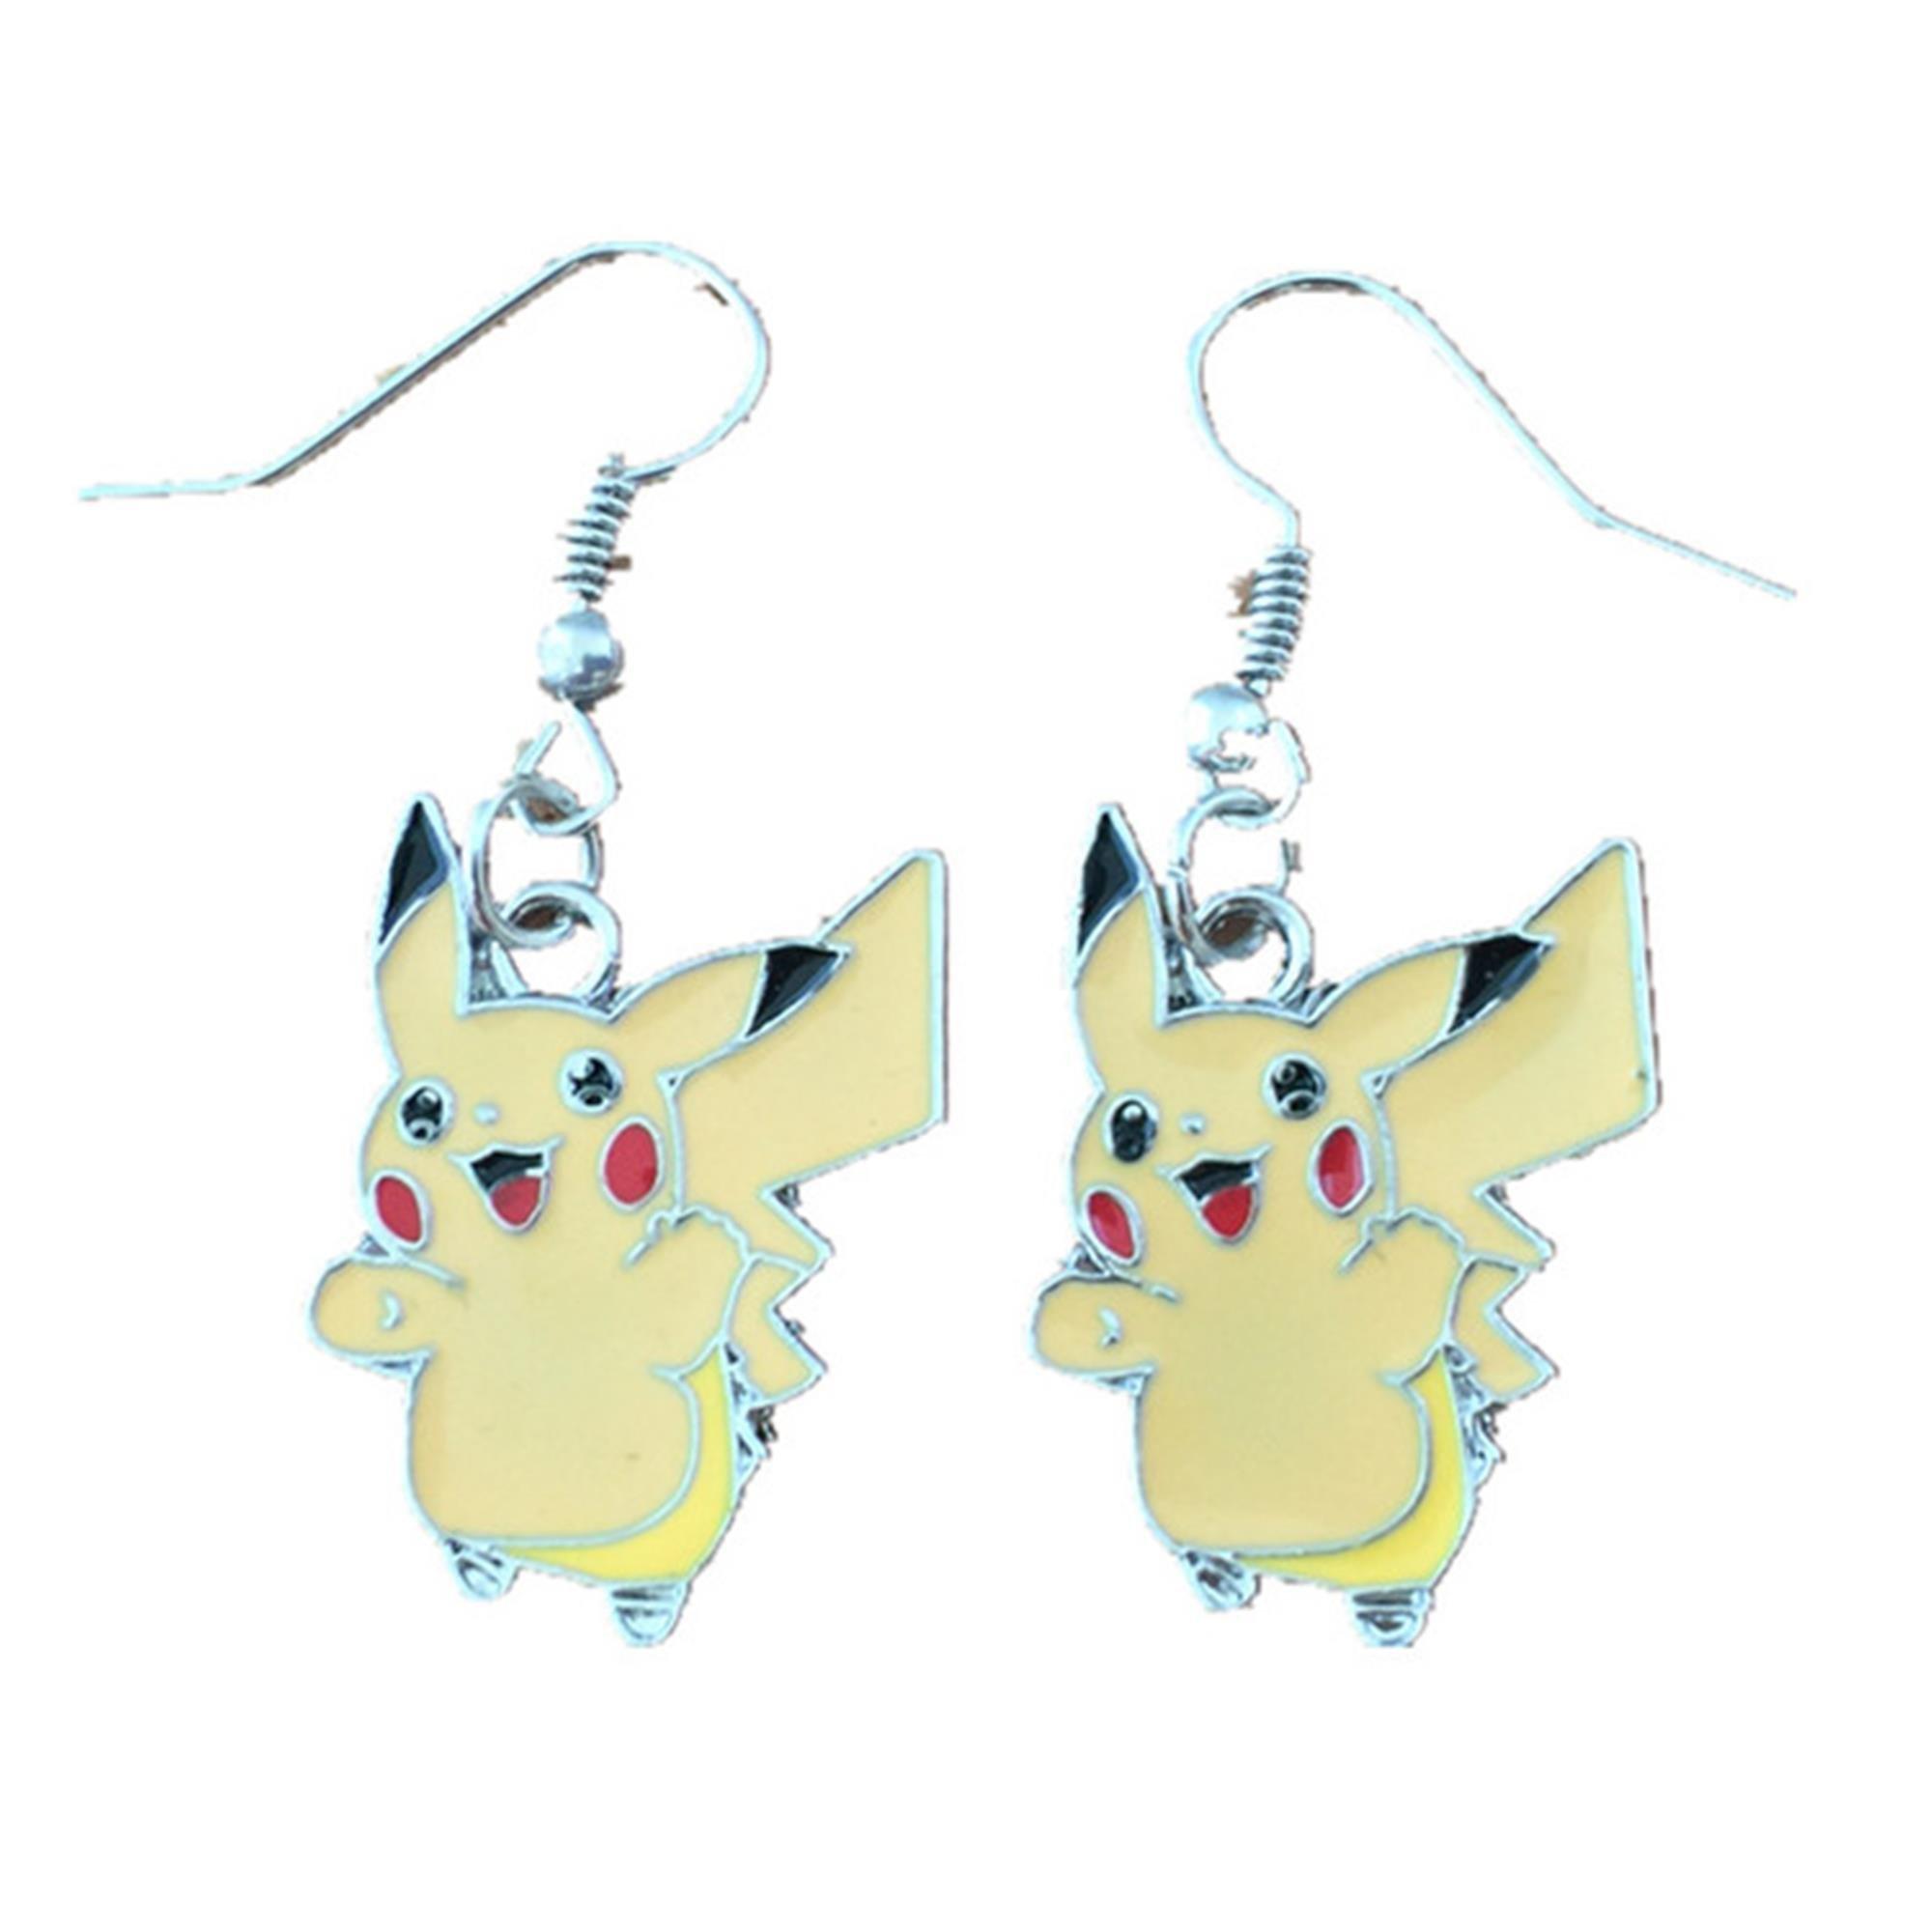 Outlander Pokemon Pikachu Earring Dangles In Gift Box From